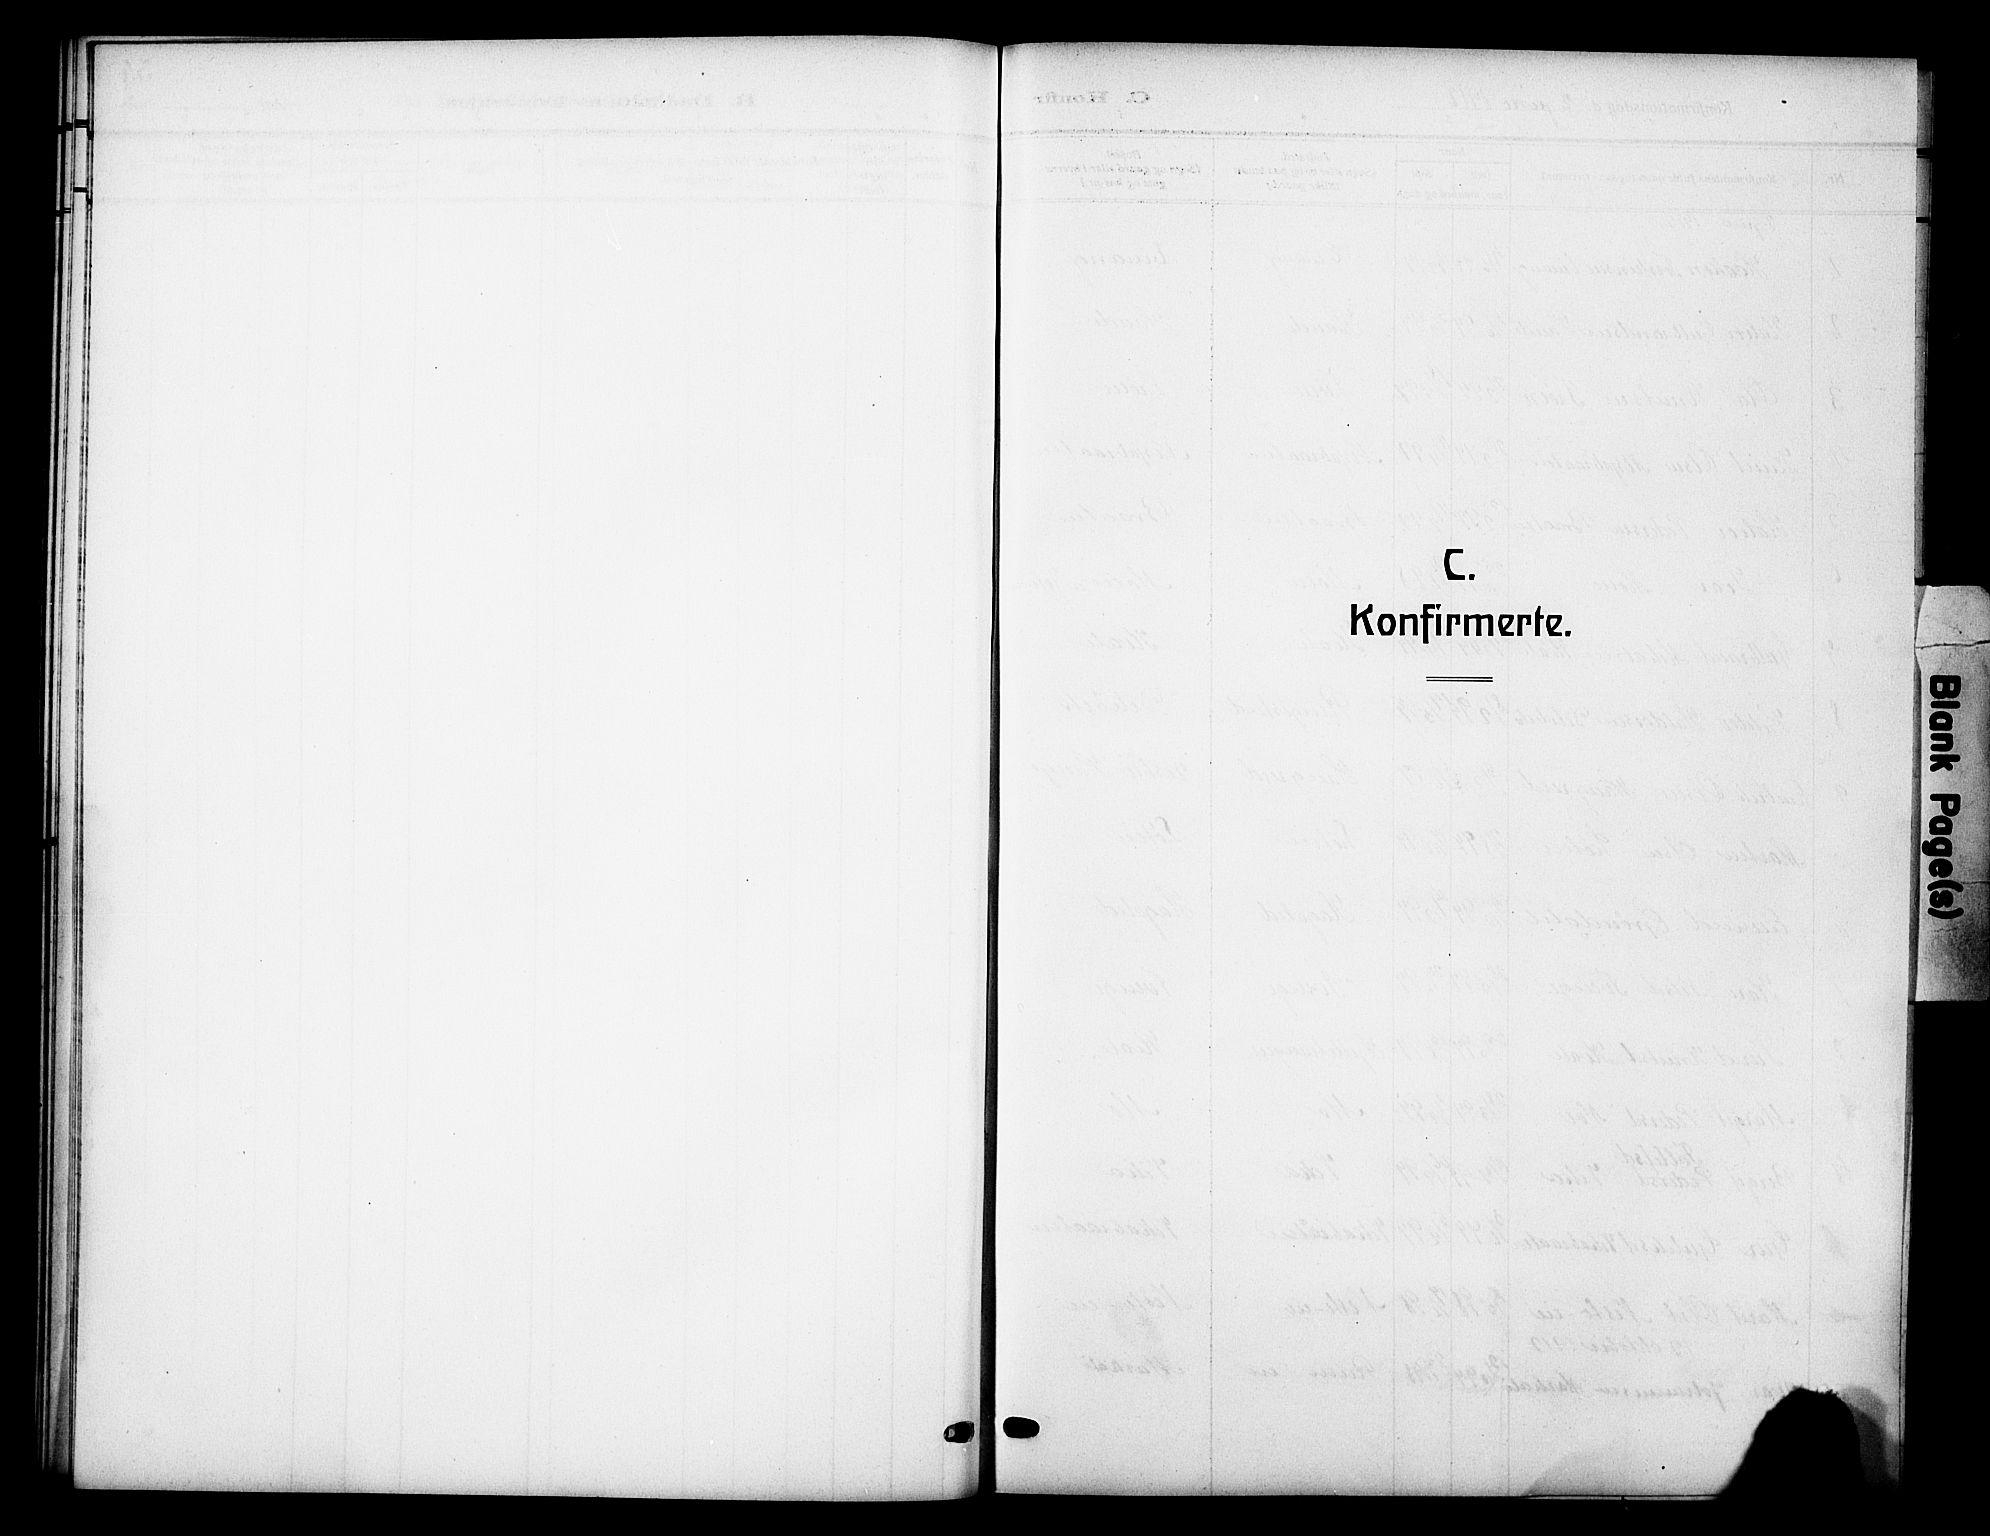 SAH, Vestre Slidre prestekontor, Klokkerbok nr. 7, 1909-1930, s. 52